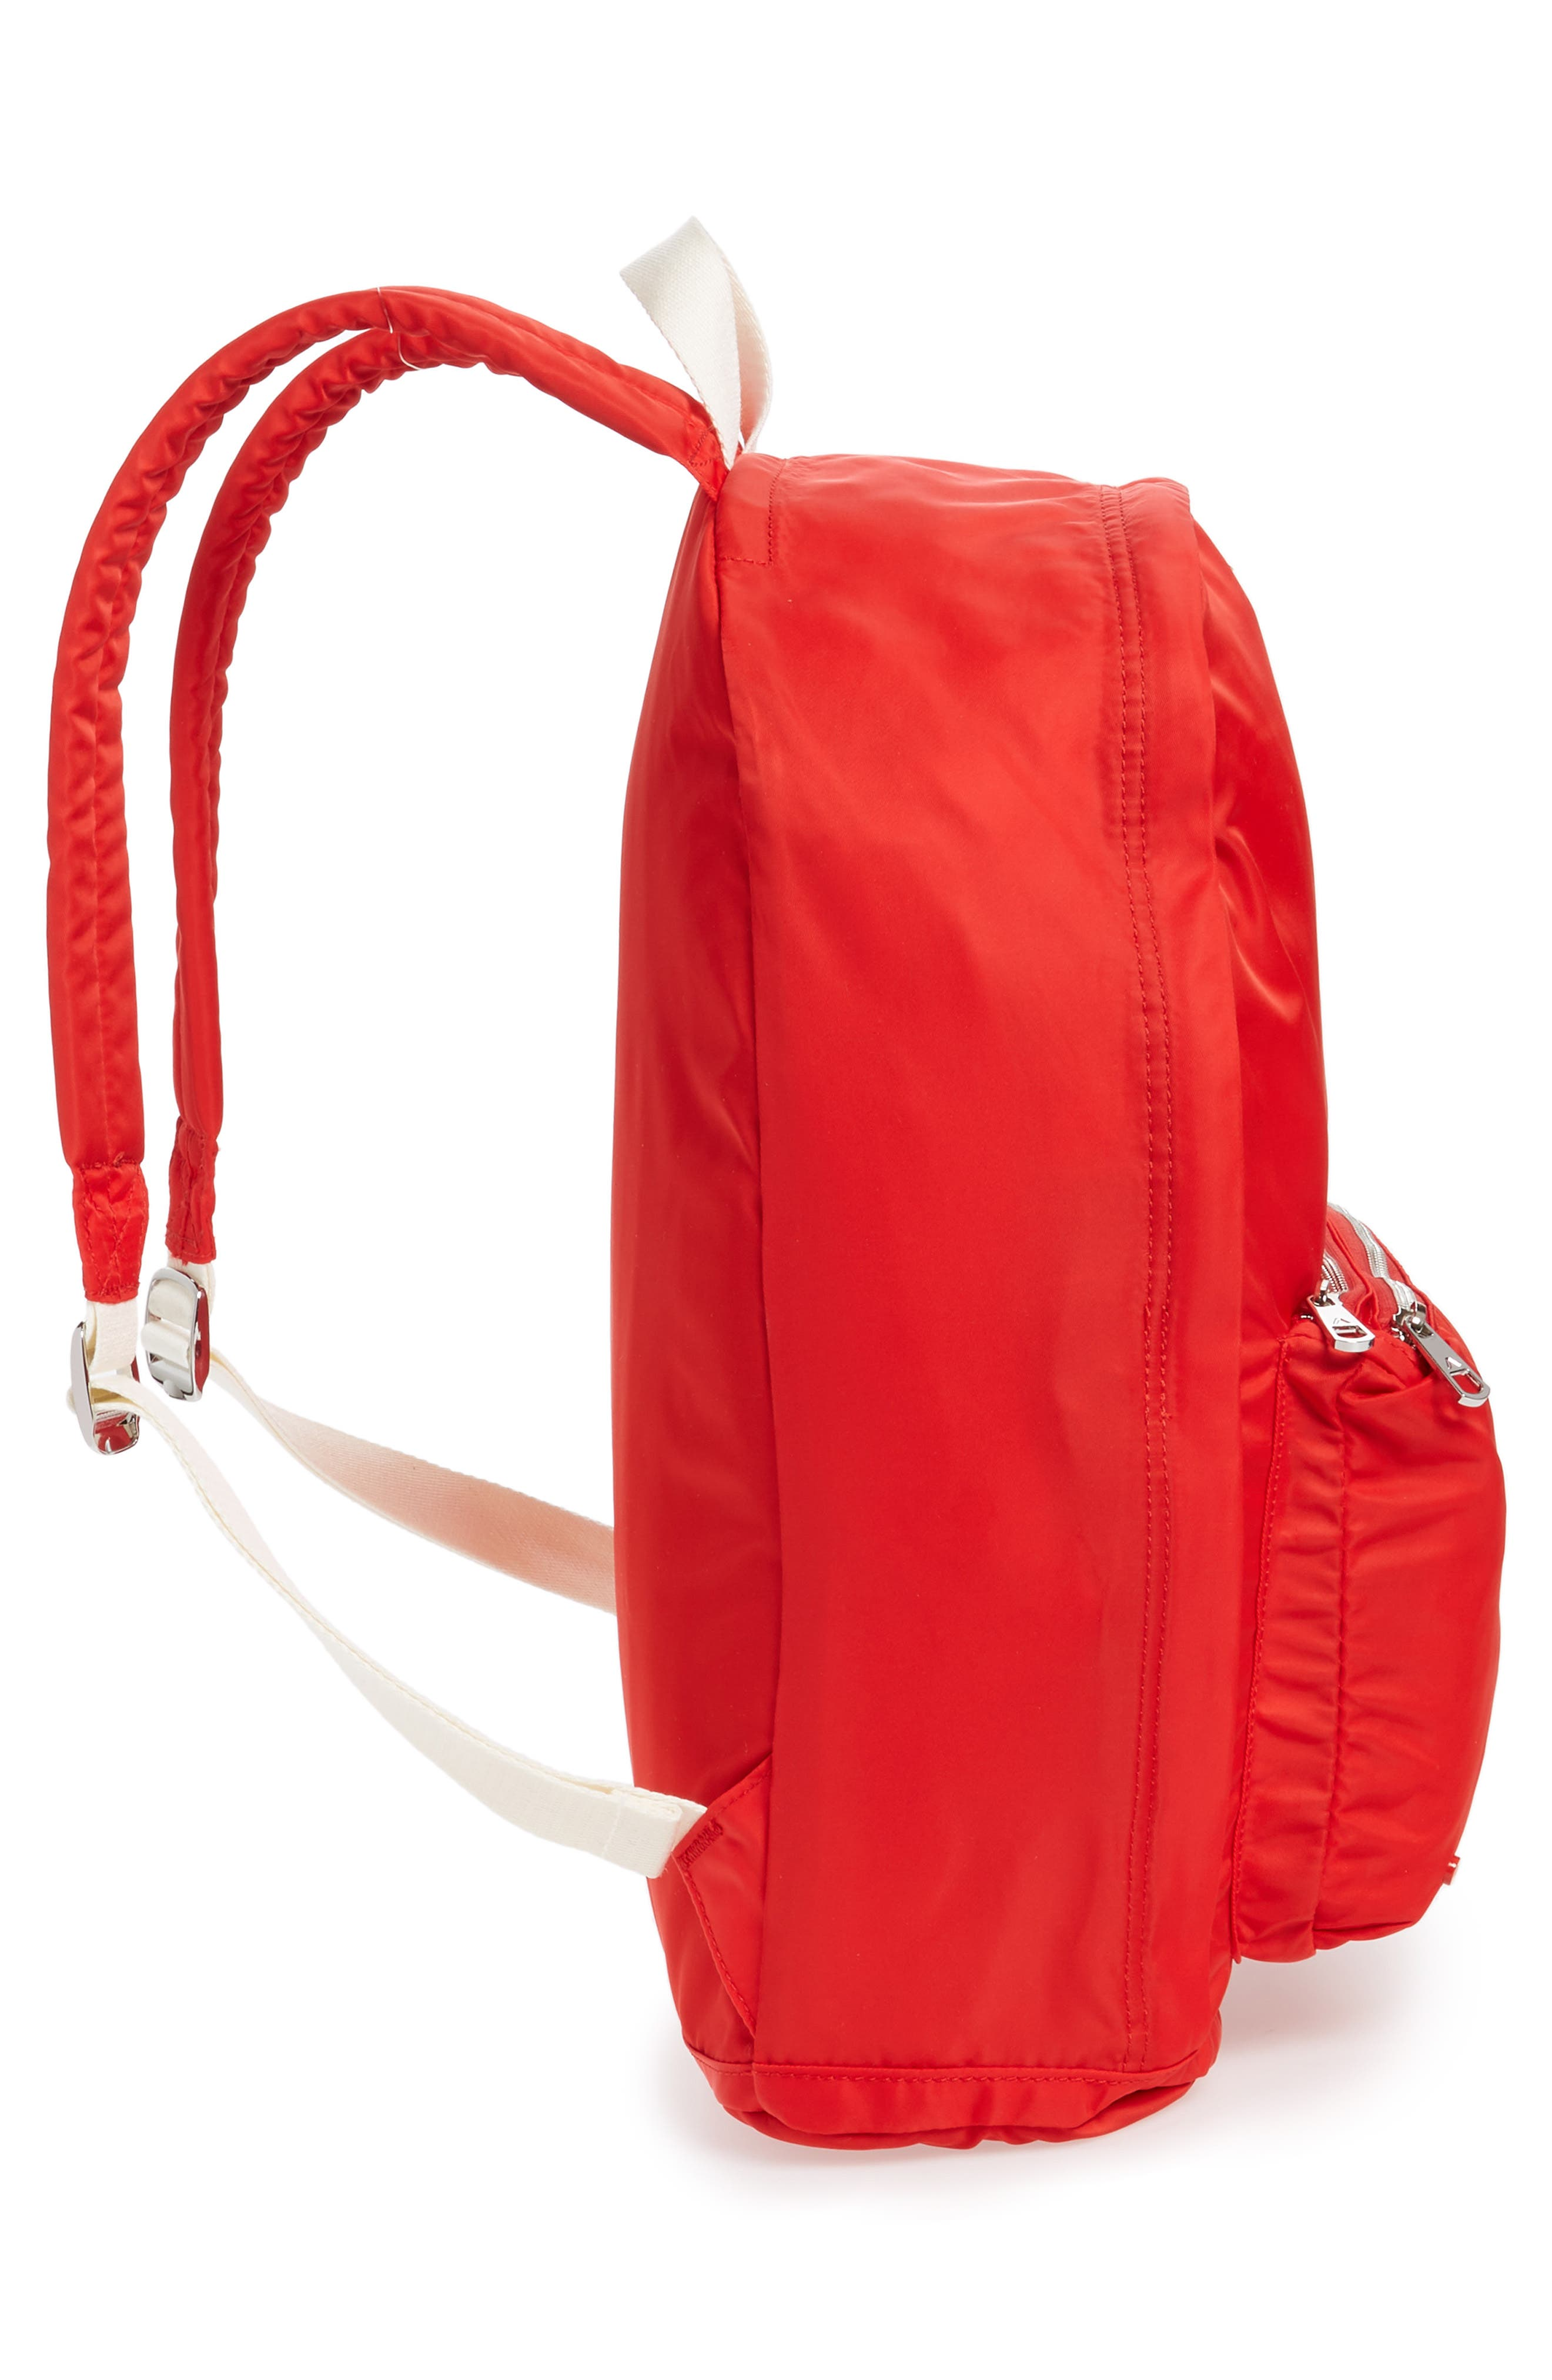 Heights Lorimer Nylon Backpack,                             Alternate thumbnail 5, color,                             Red